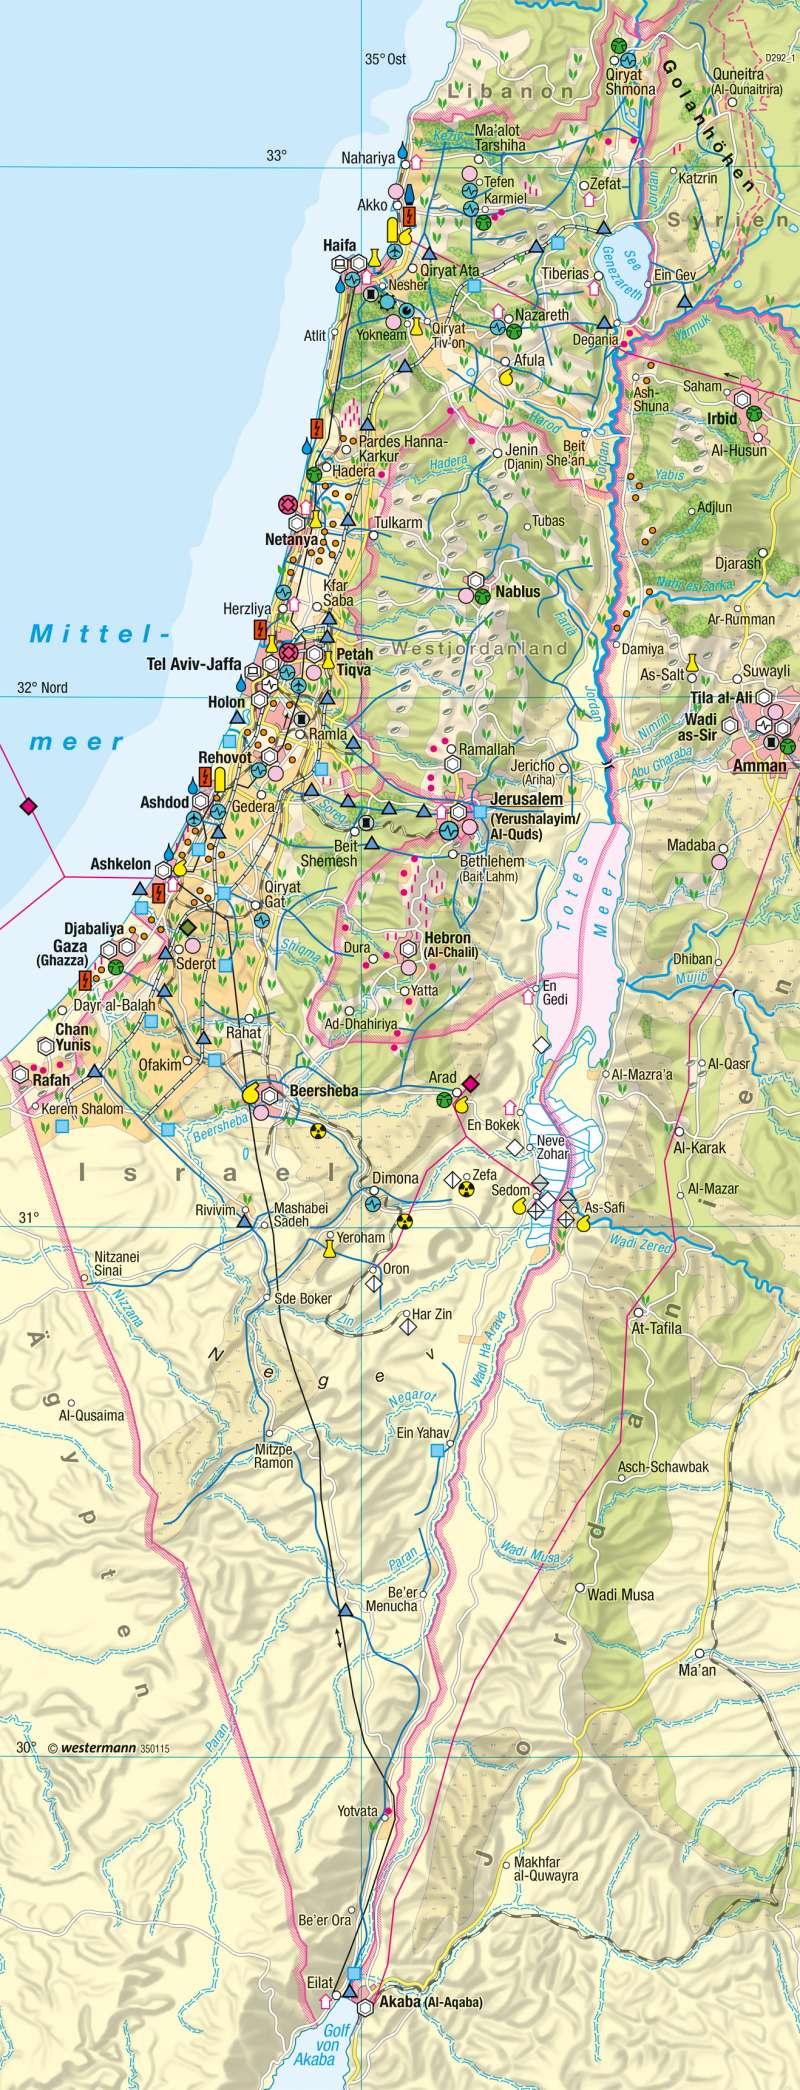 Israel Karte.Diercke Weltatlas Kartenansicht Naher Osten Israel